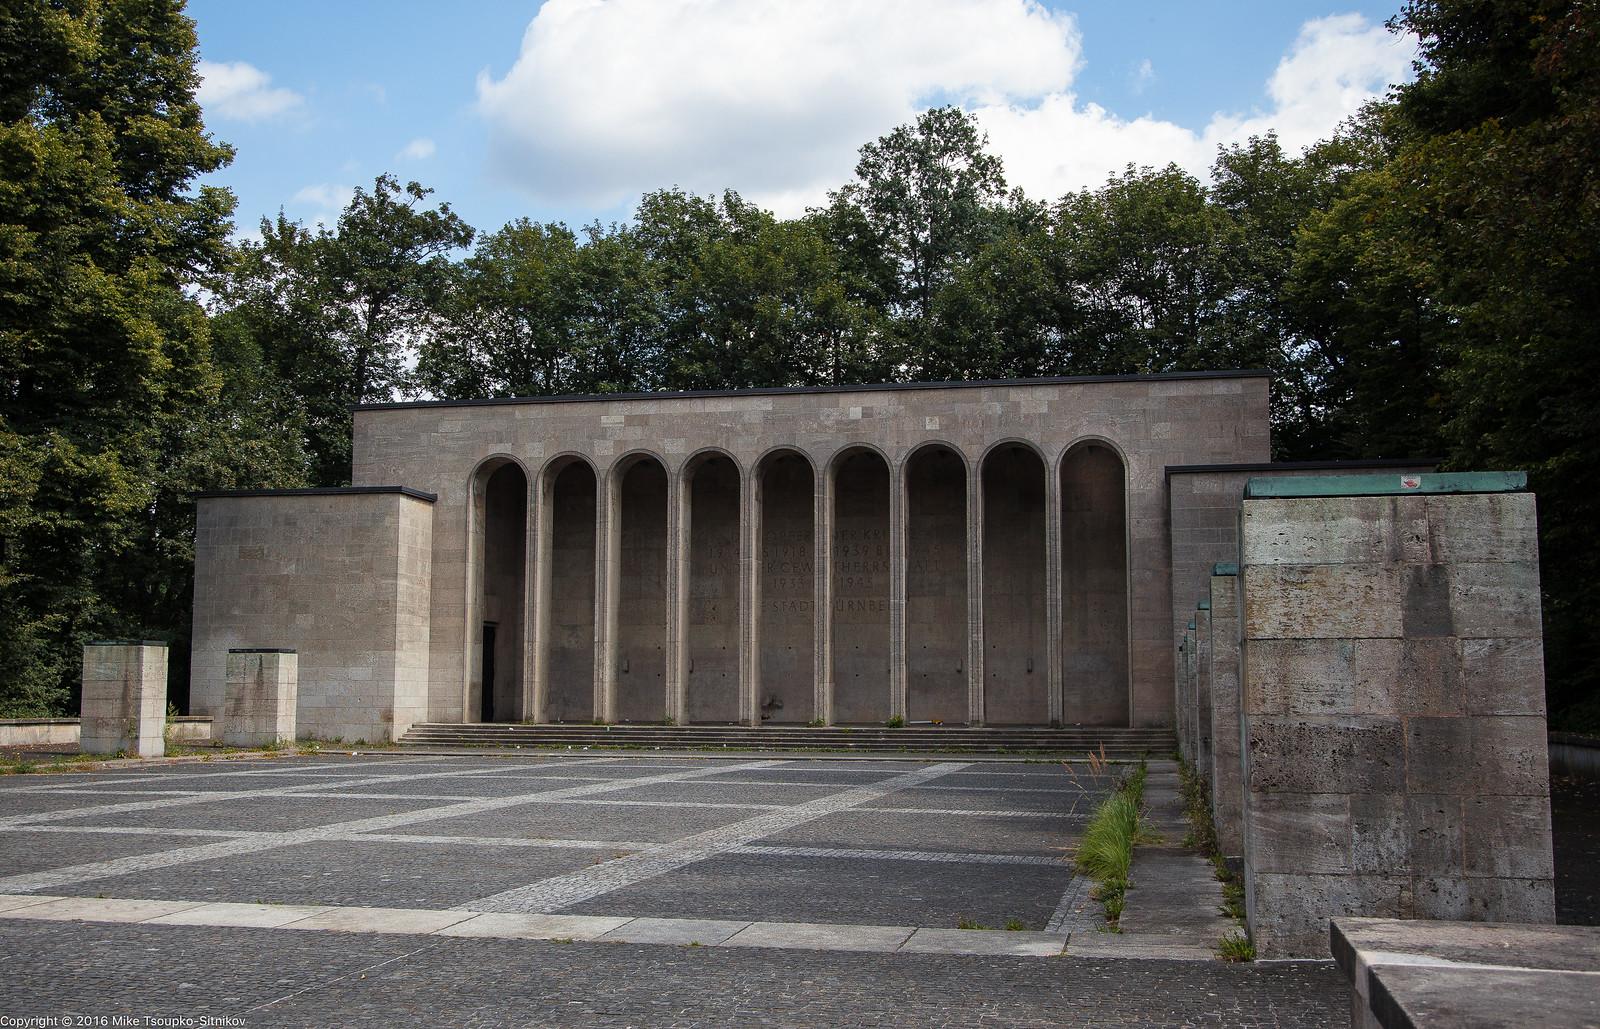 Nuremberg. The Erenhalle rally site